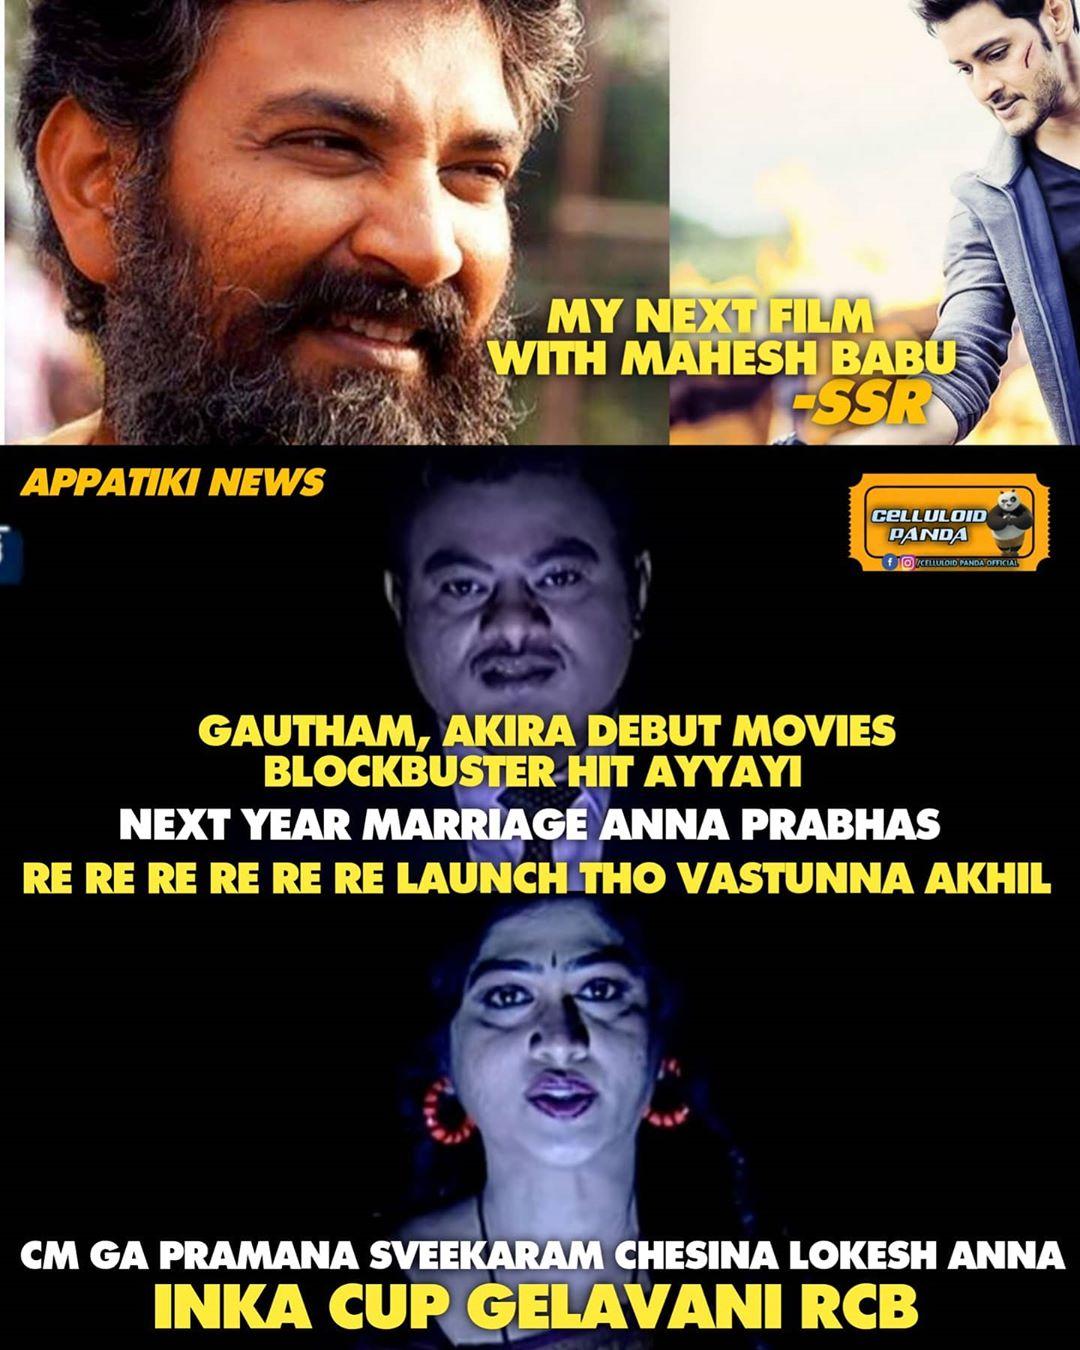 1. Mahesh Babu And Ss Rajamouli Memes